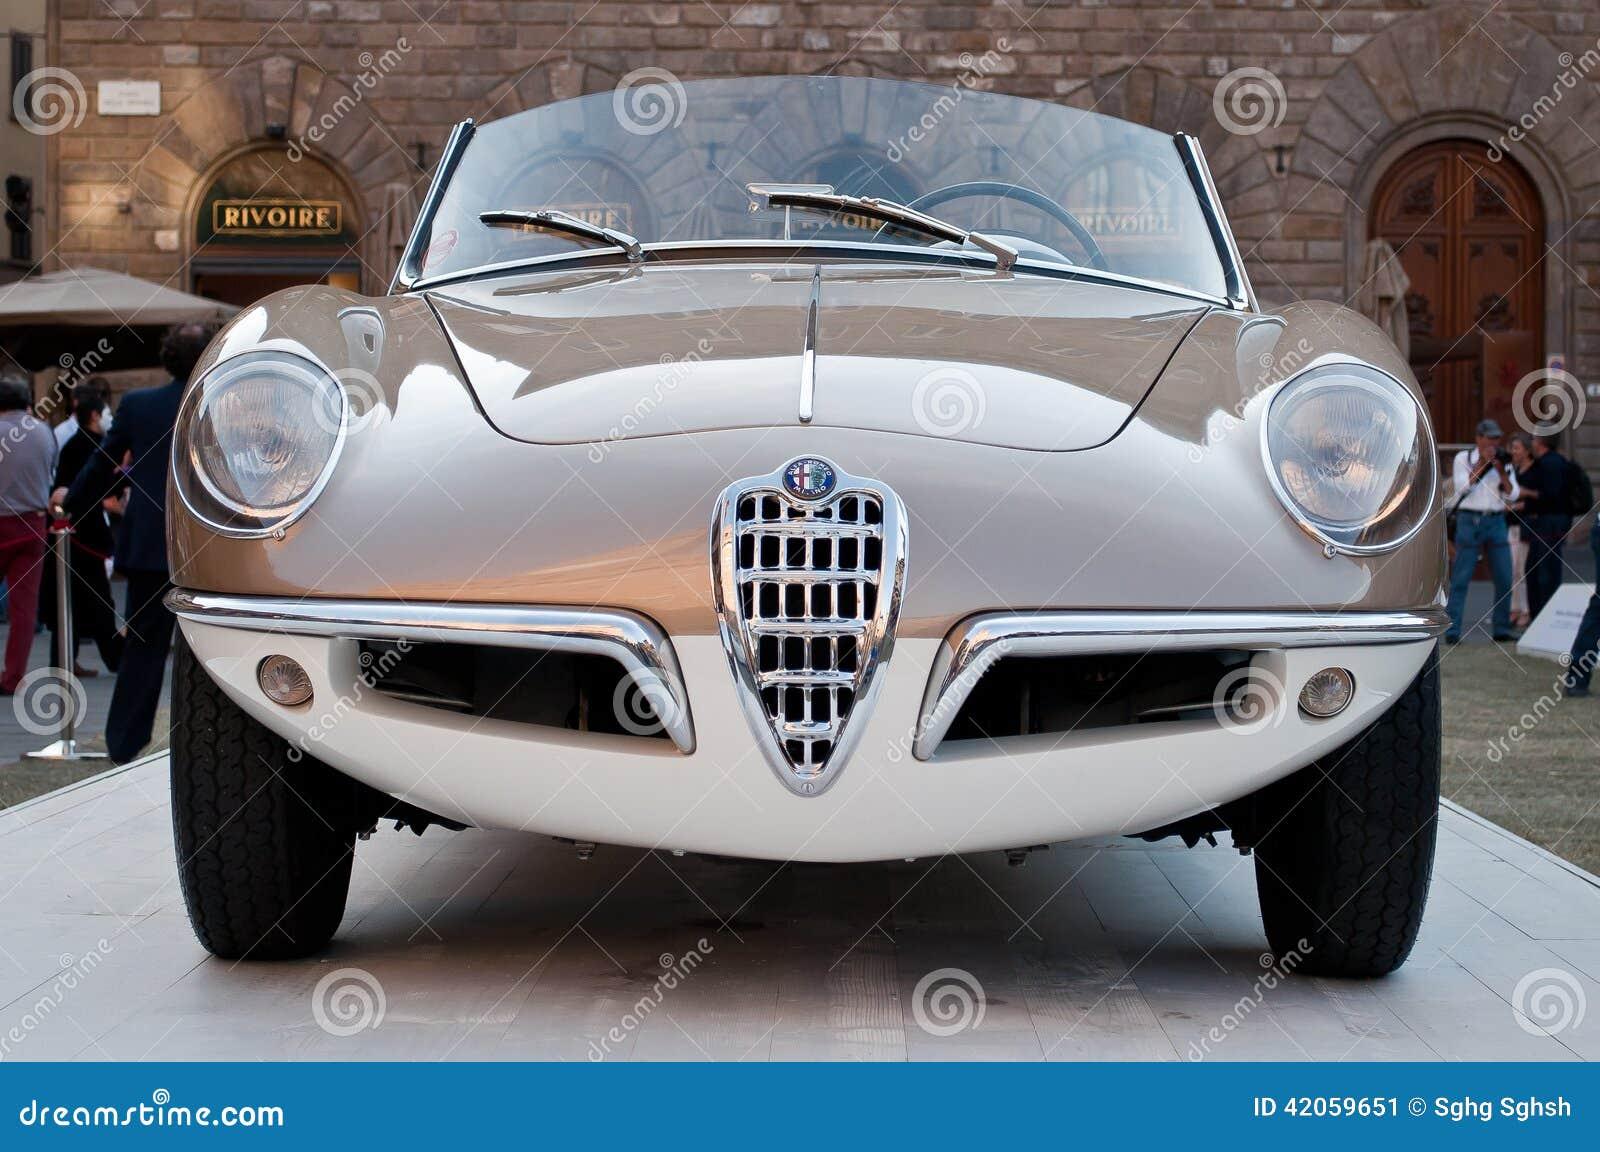 alfa romeo giulietta spider 1955 editorial photo - image: 42059651